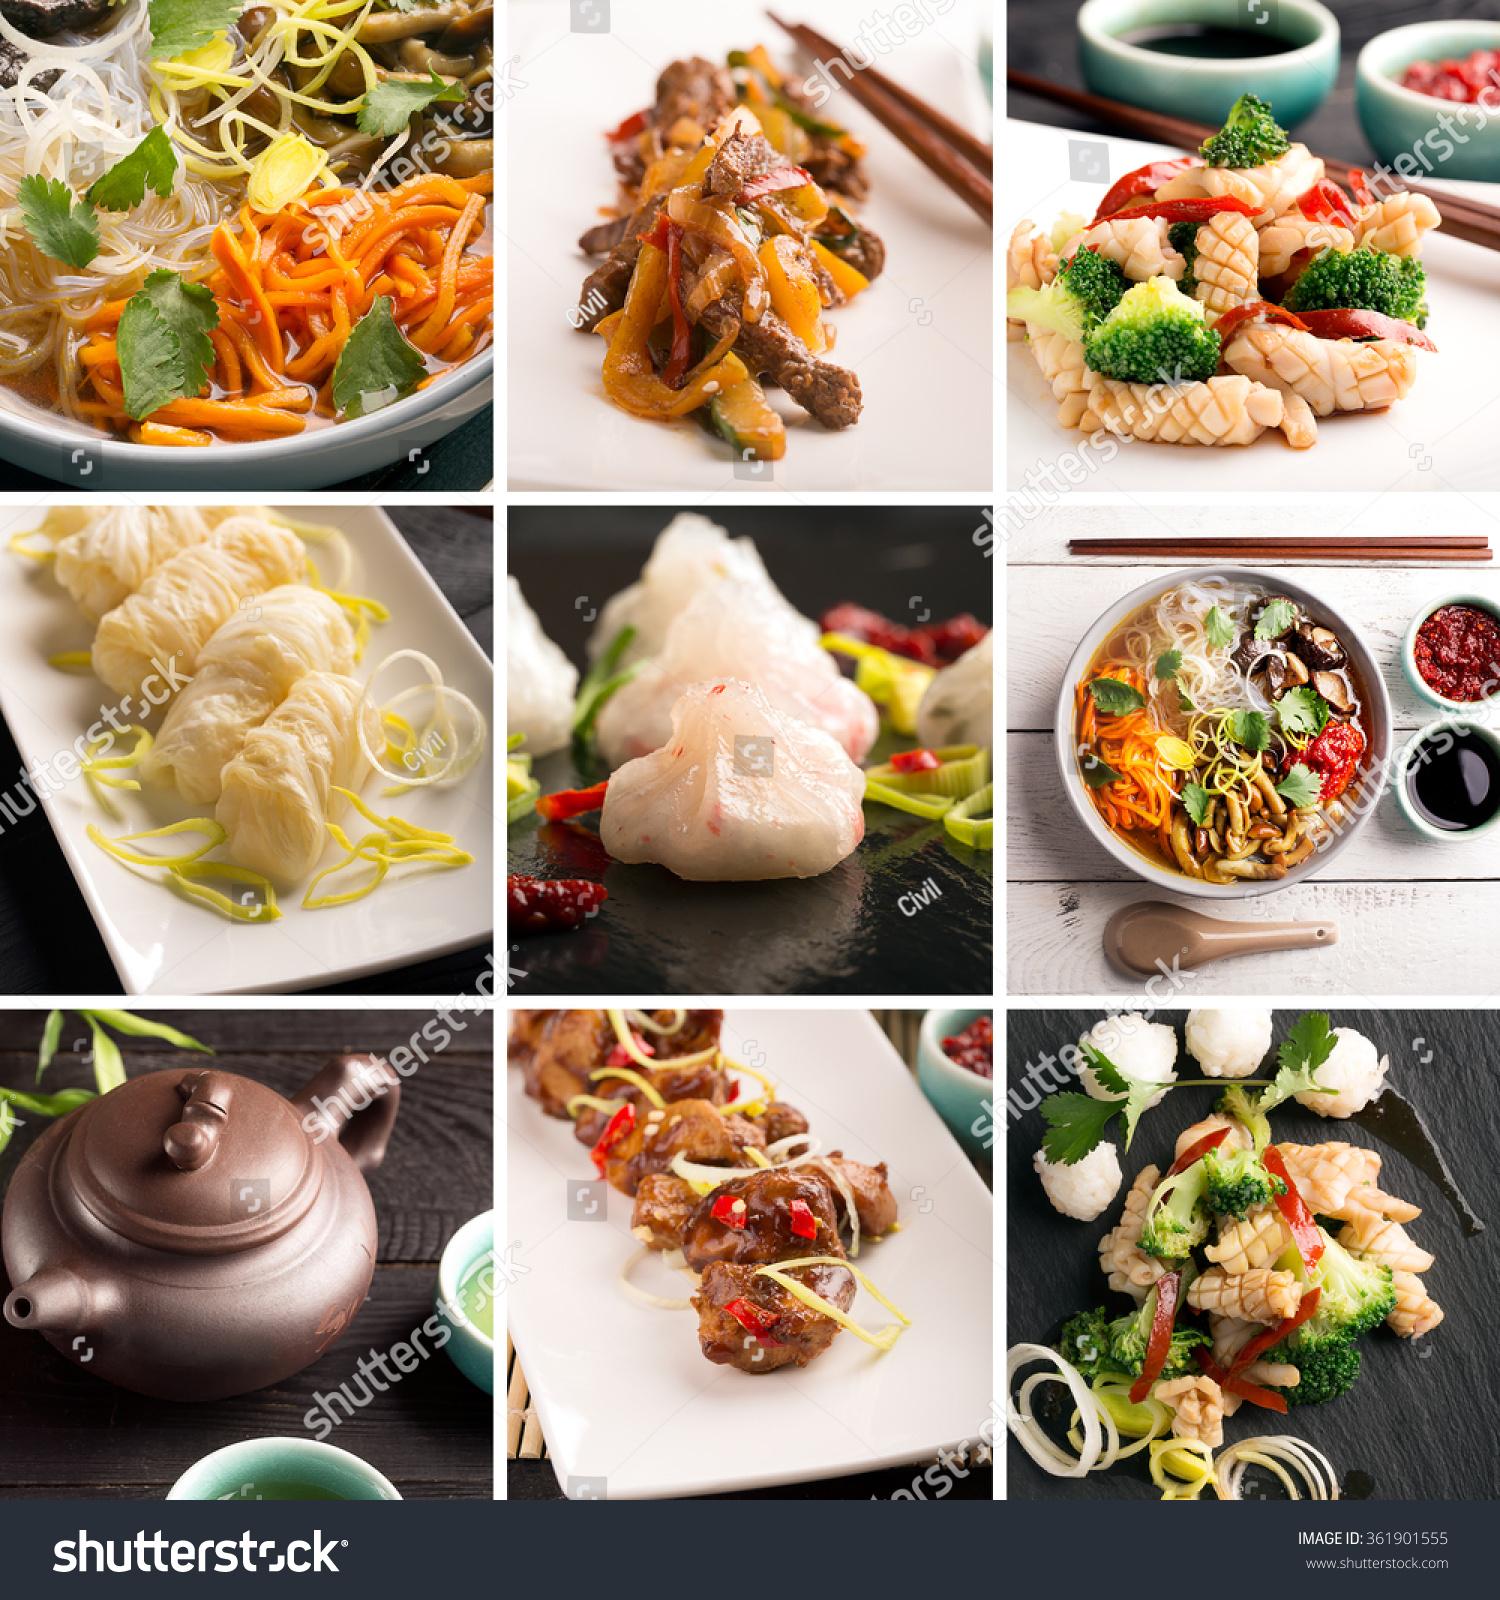 Best Free Food Stock Photo Sites